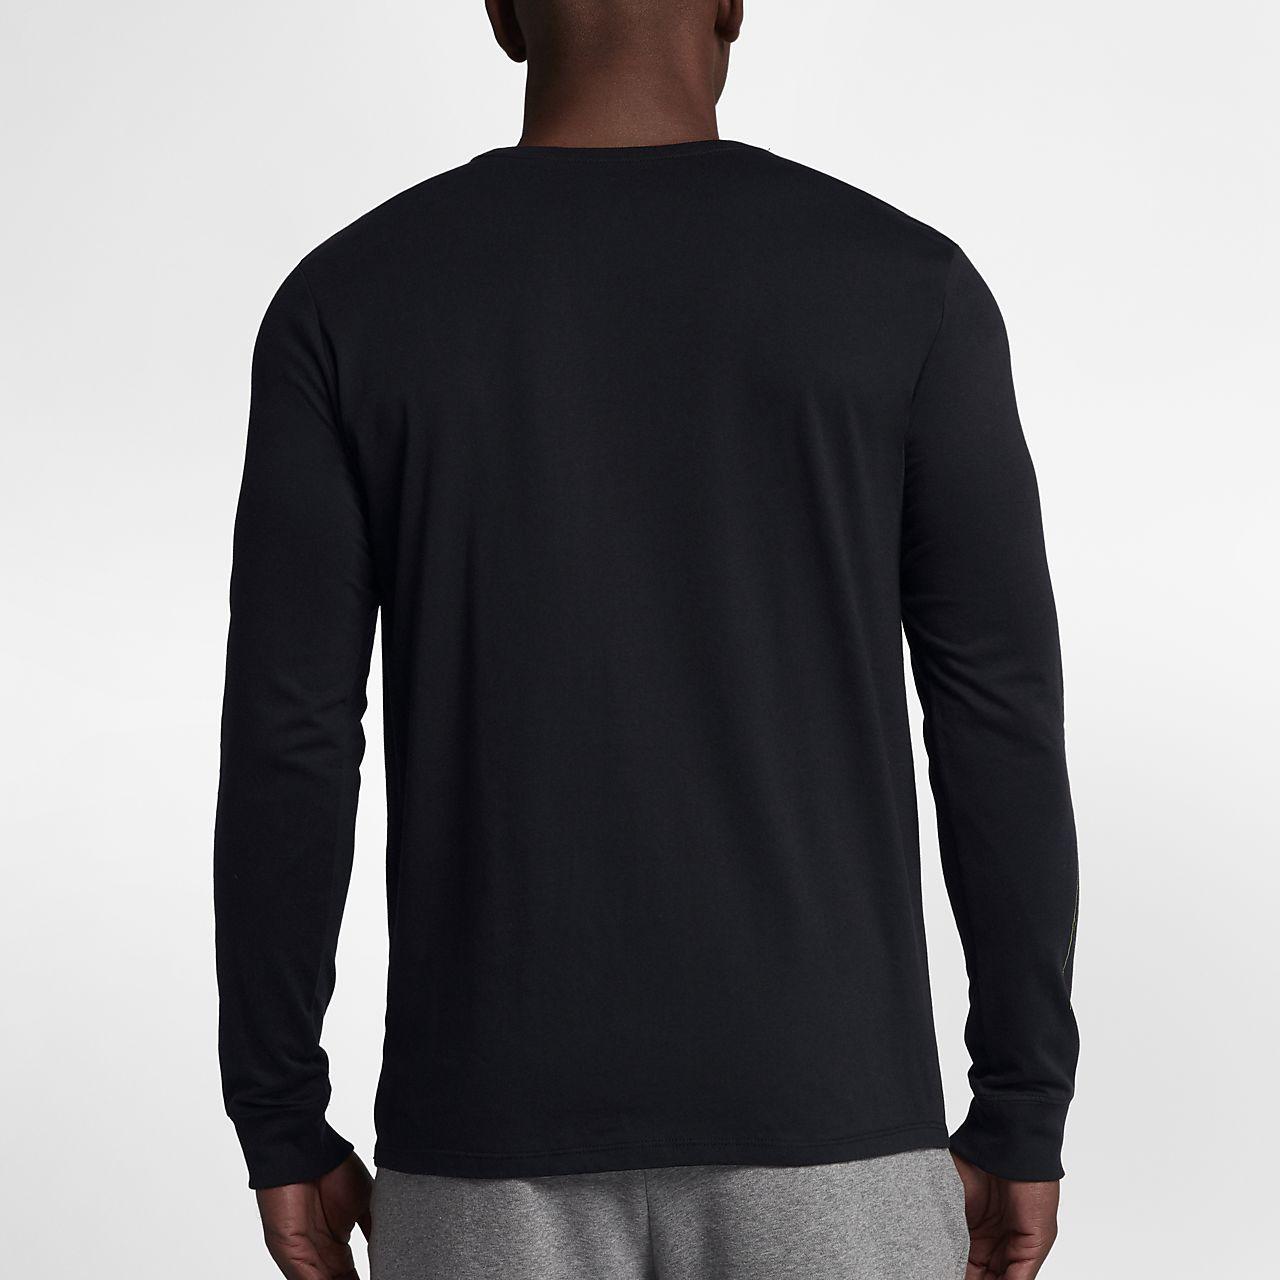 classic fit d07e5 cb8b7 Nike Jordan Long Sleeve Shirts